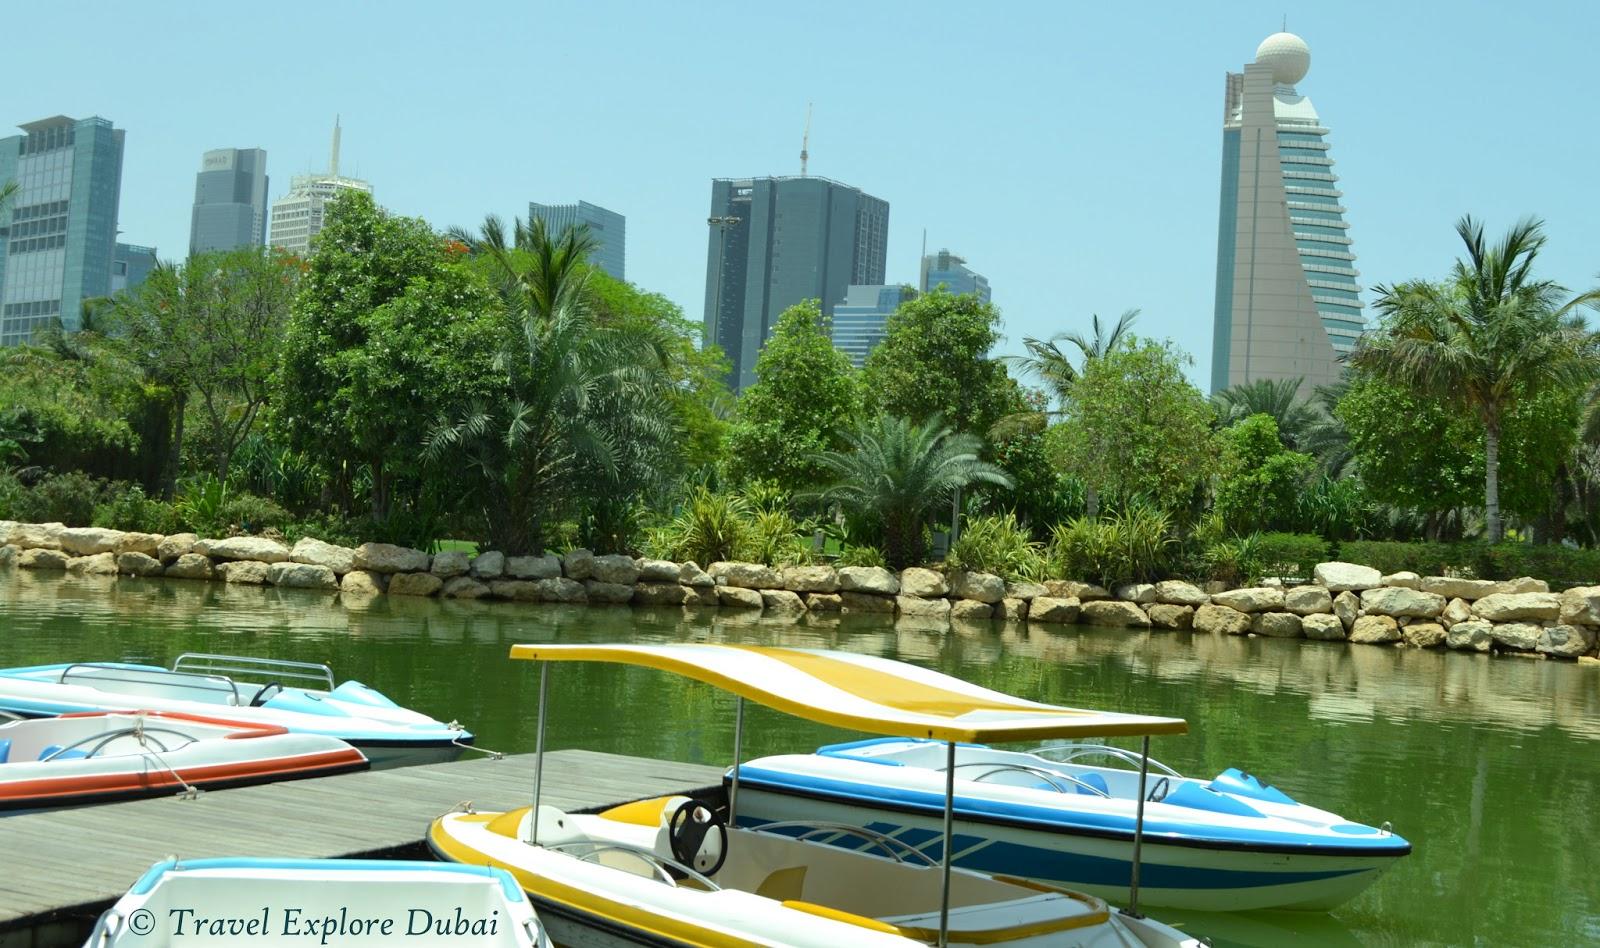 Ihram Kids For Sale Dubai: Travel Explore Dubai: ZABEEL PARK